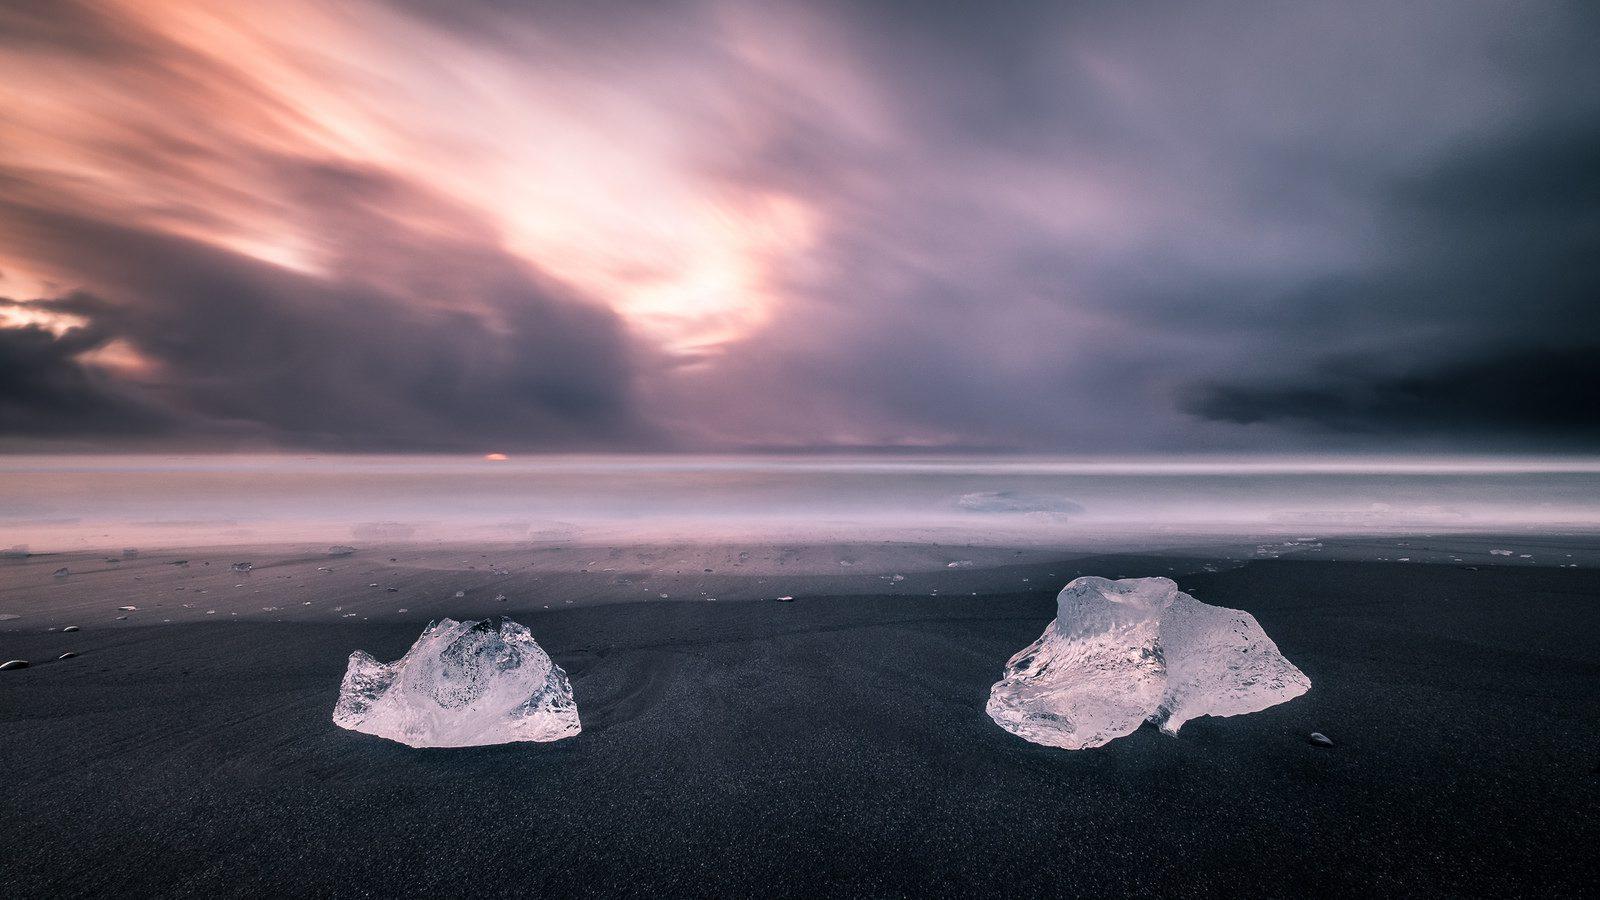 ice on a beach - lab-created diamonds